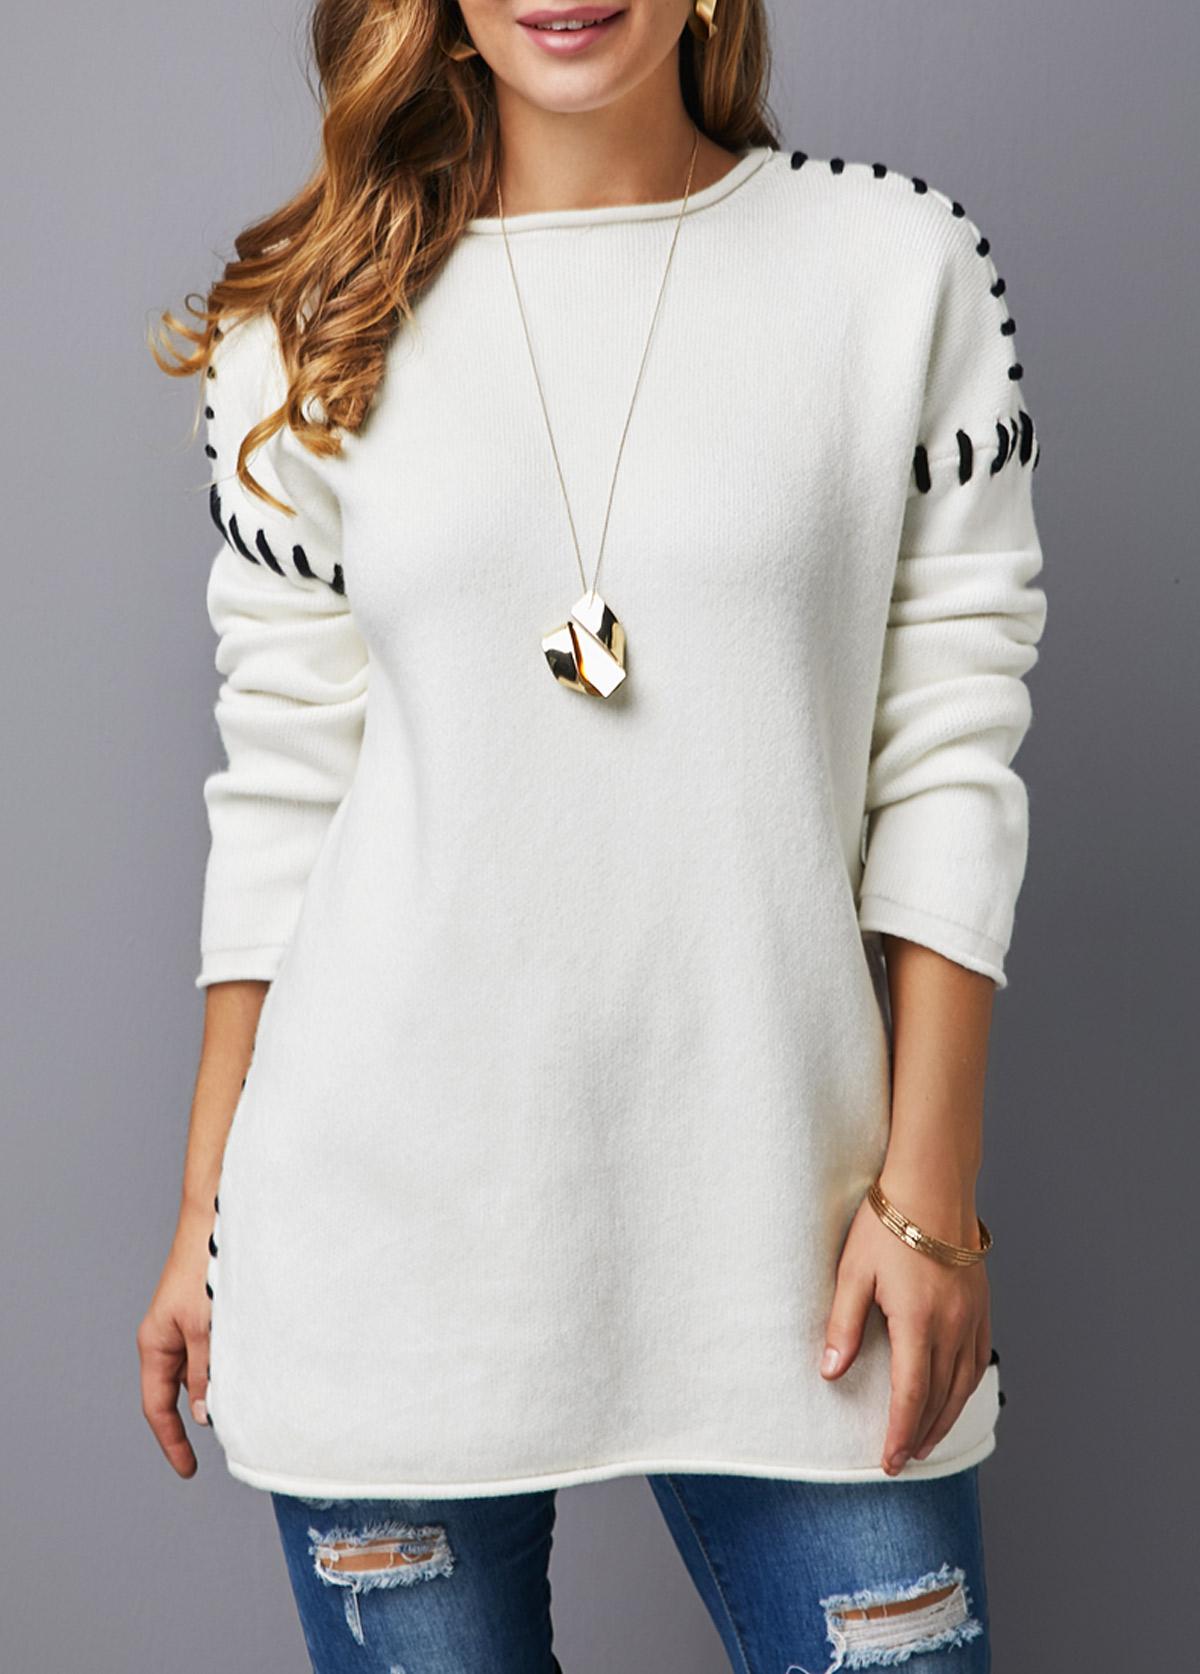 Long Sleeve White Round Neck Sweater